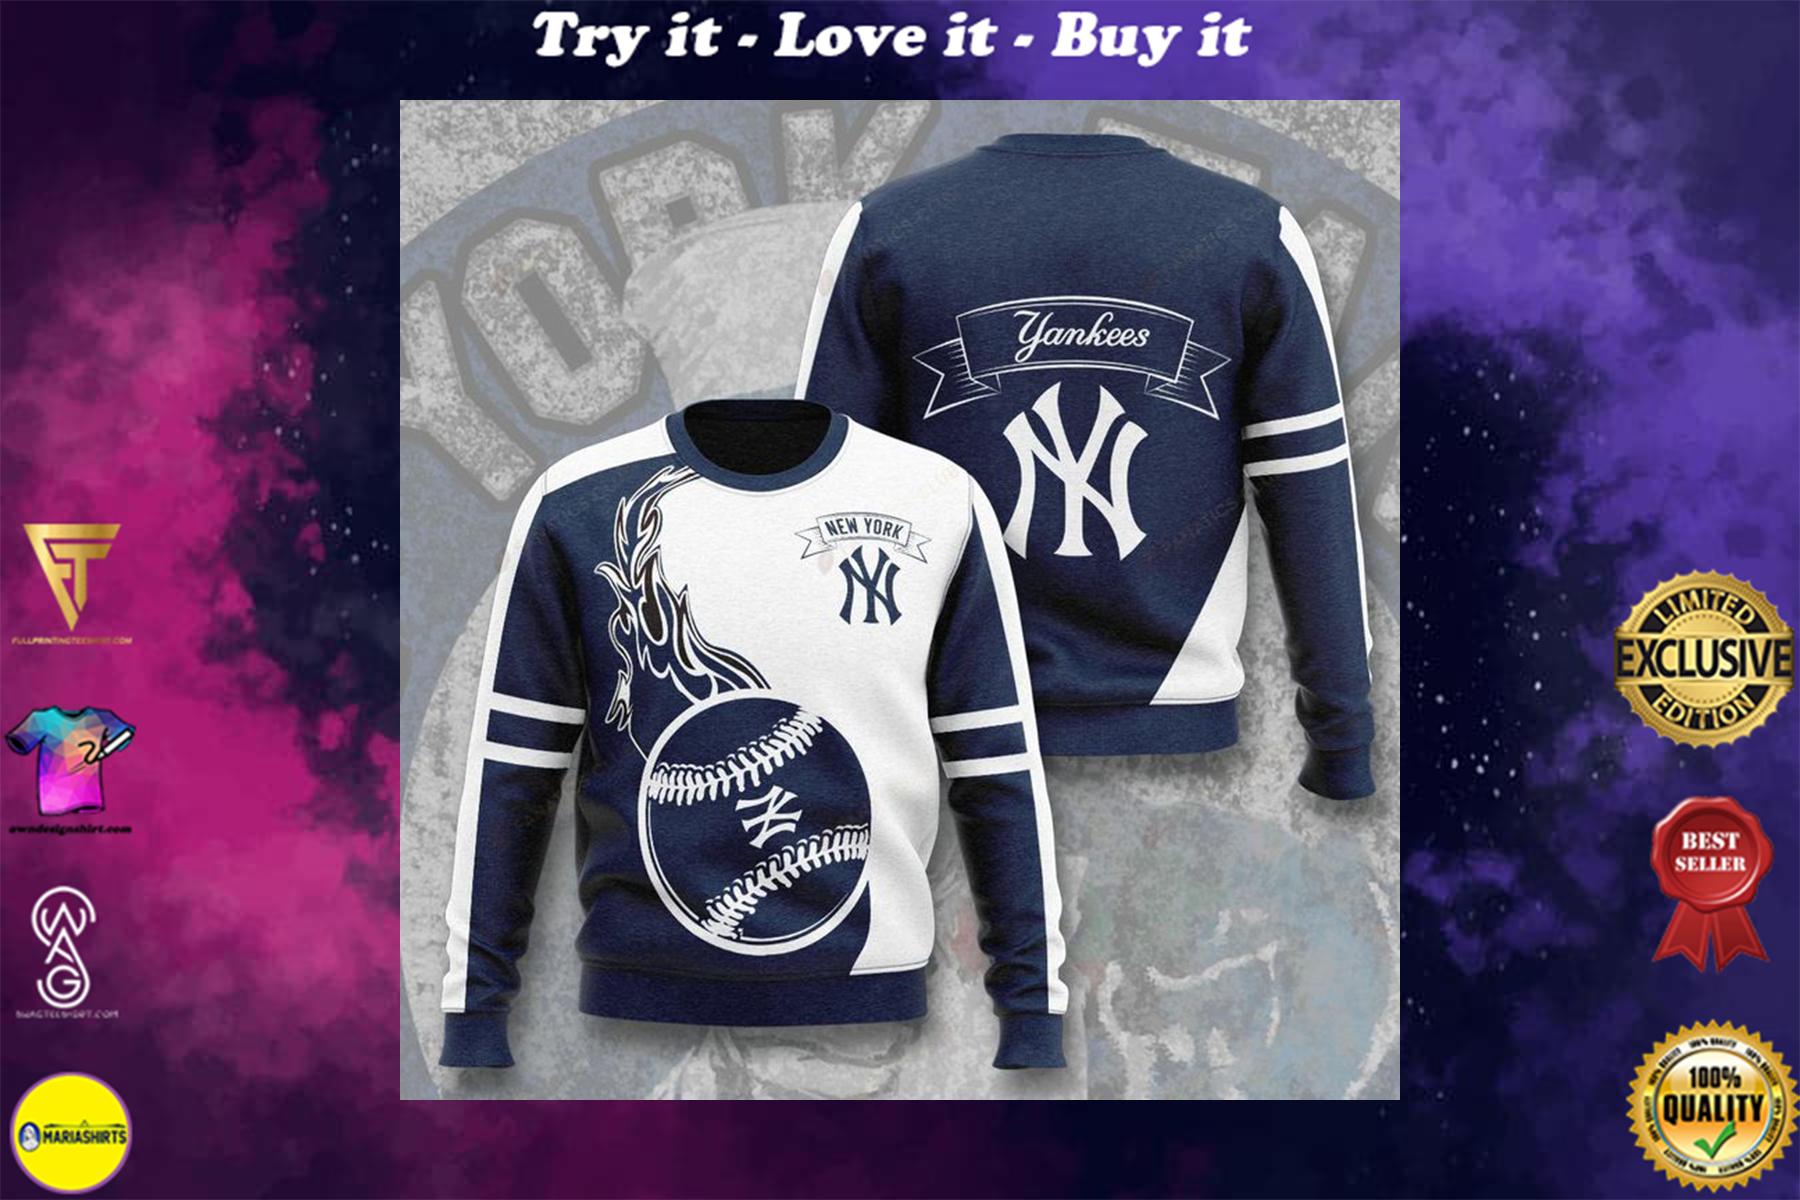 [highest selling] major league baseball new york yankees full printing ugly sweater - maria